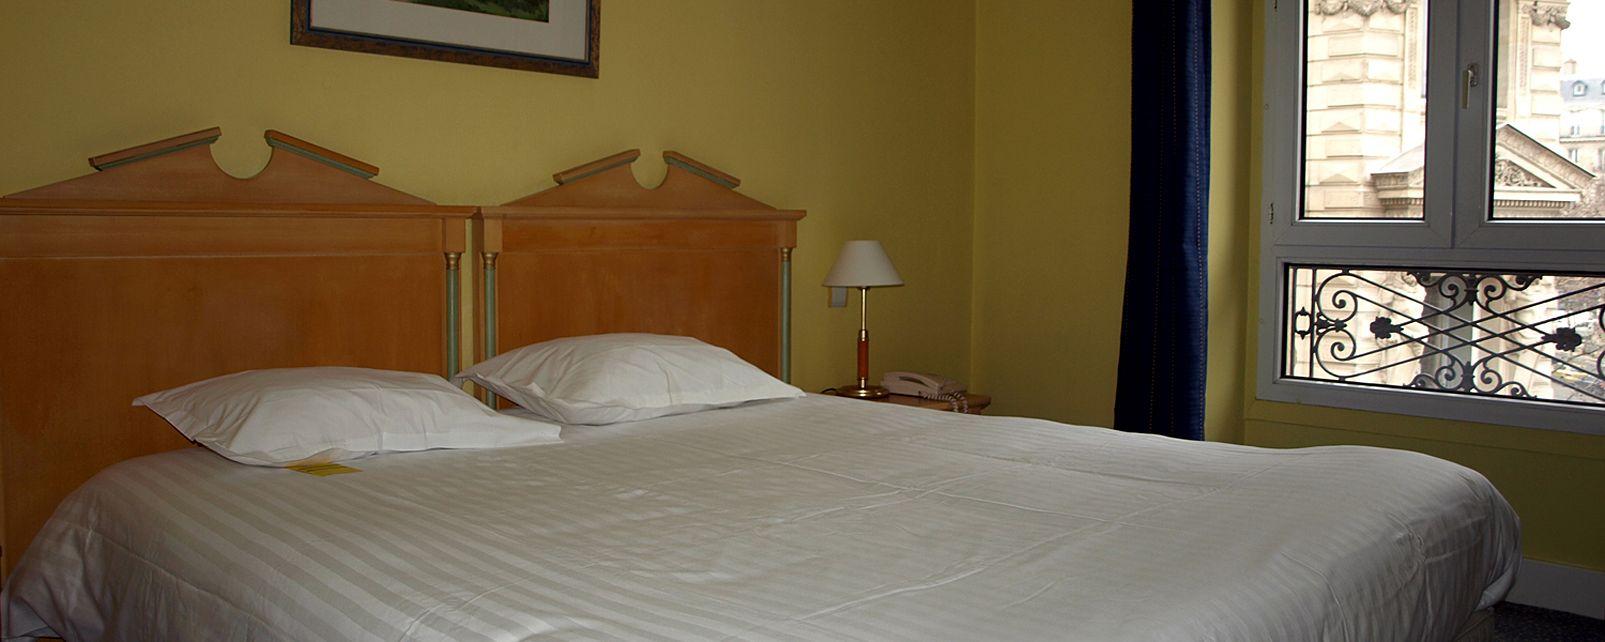 Hotel Quality Malesherbes